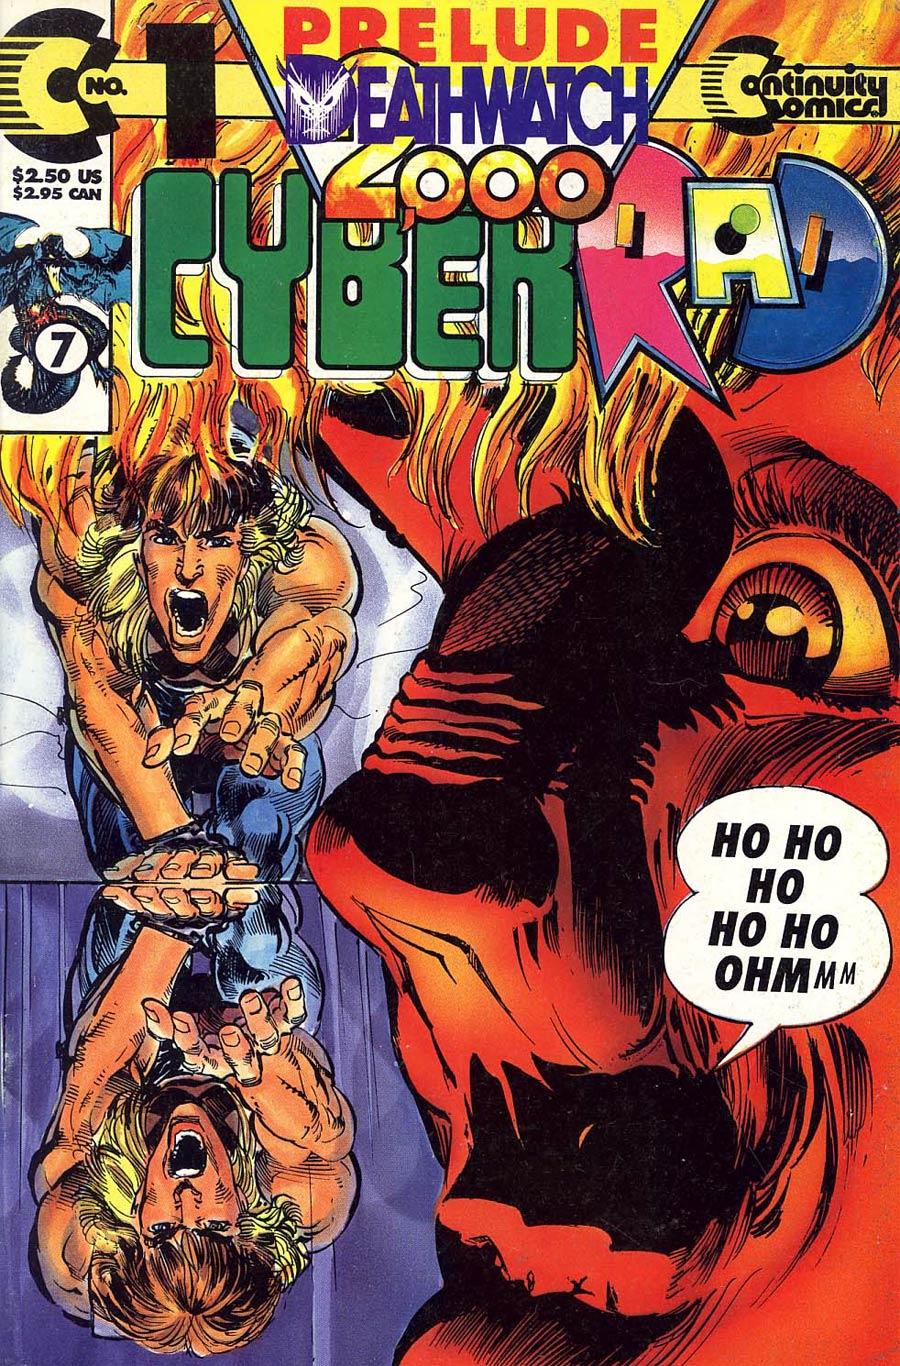 Cyberrad Deathwatch 2000 #1 no polybag